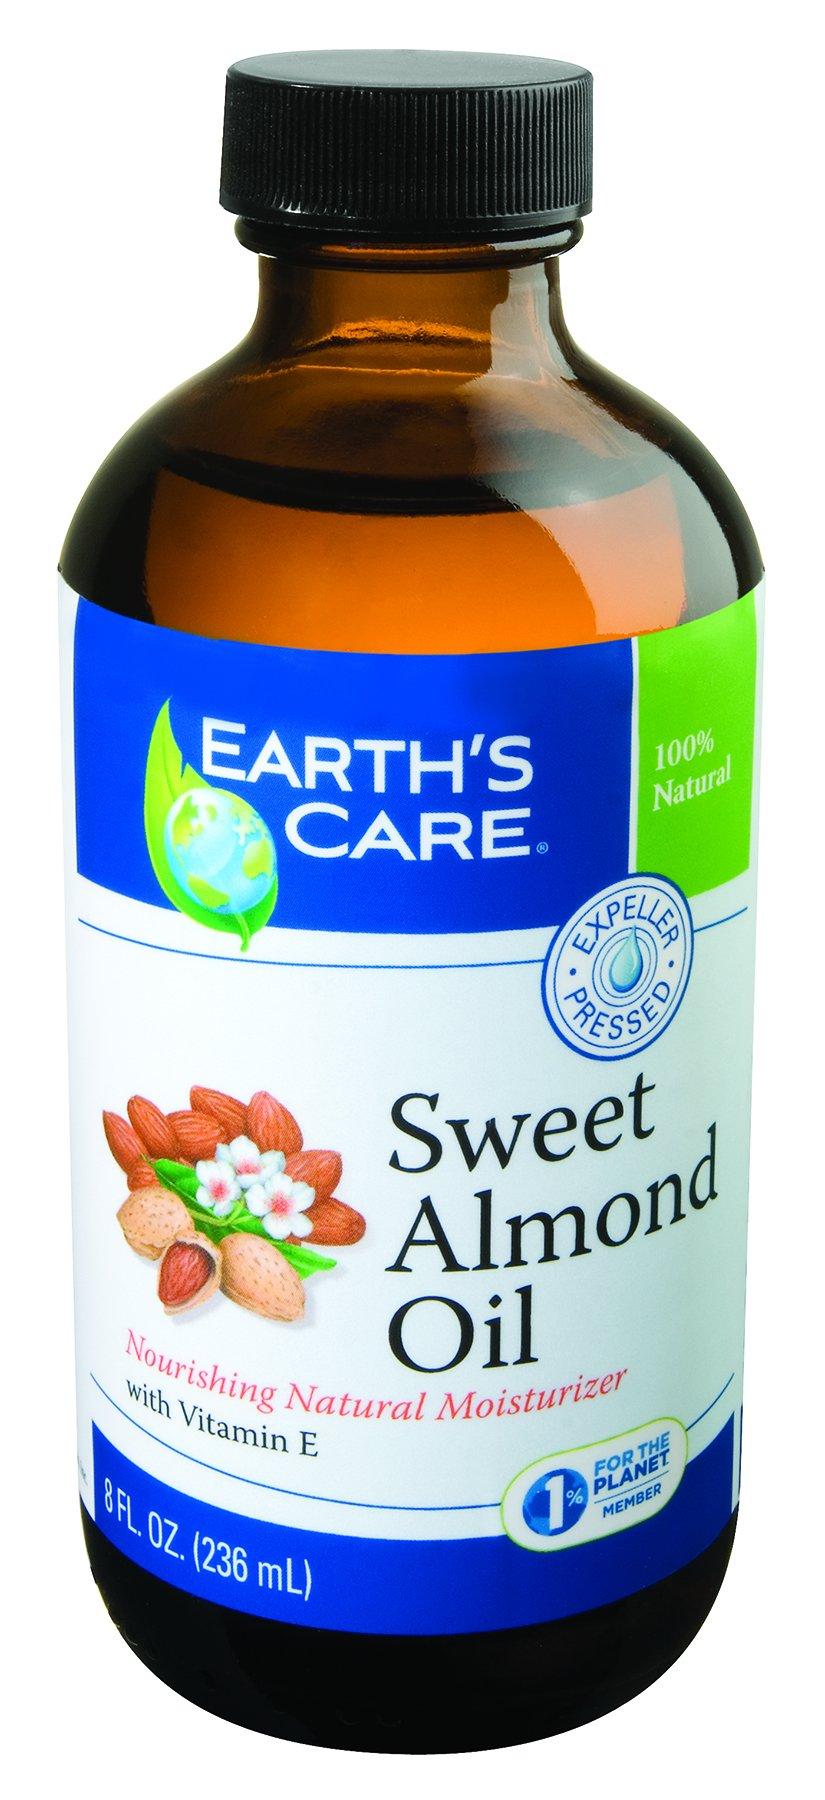 Earth's Care Sweet Almond Oil, Expeller Pressed, No Colors, Fragrances or Parabens, Vegan, Bottled in USA 8 FL. OZ.